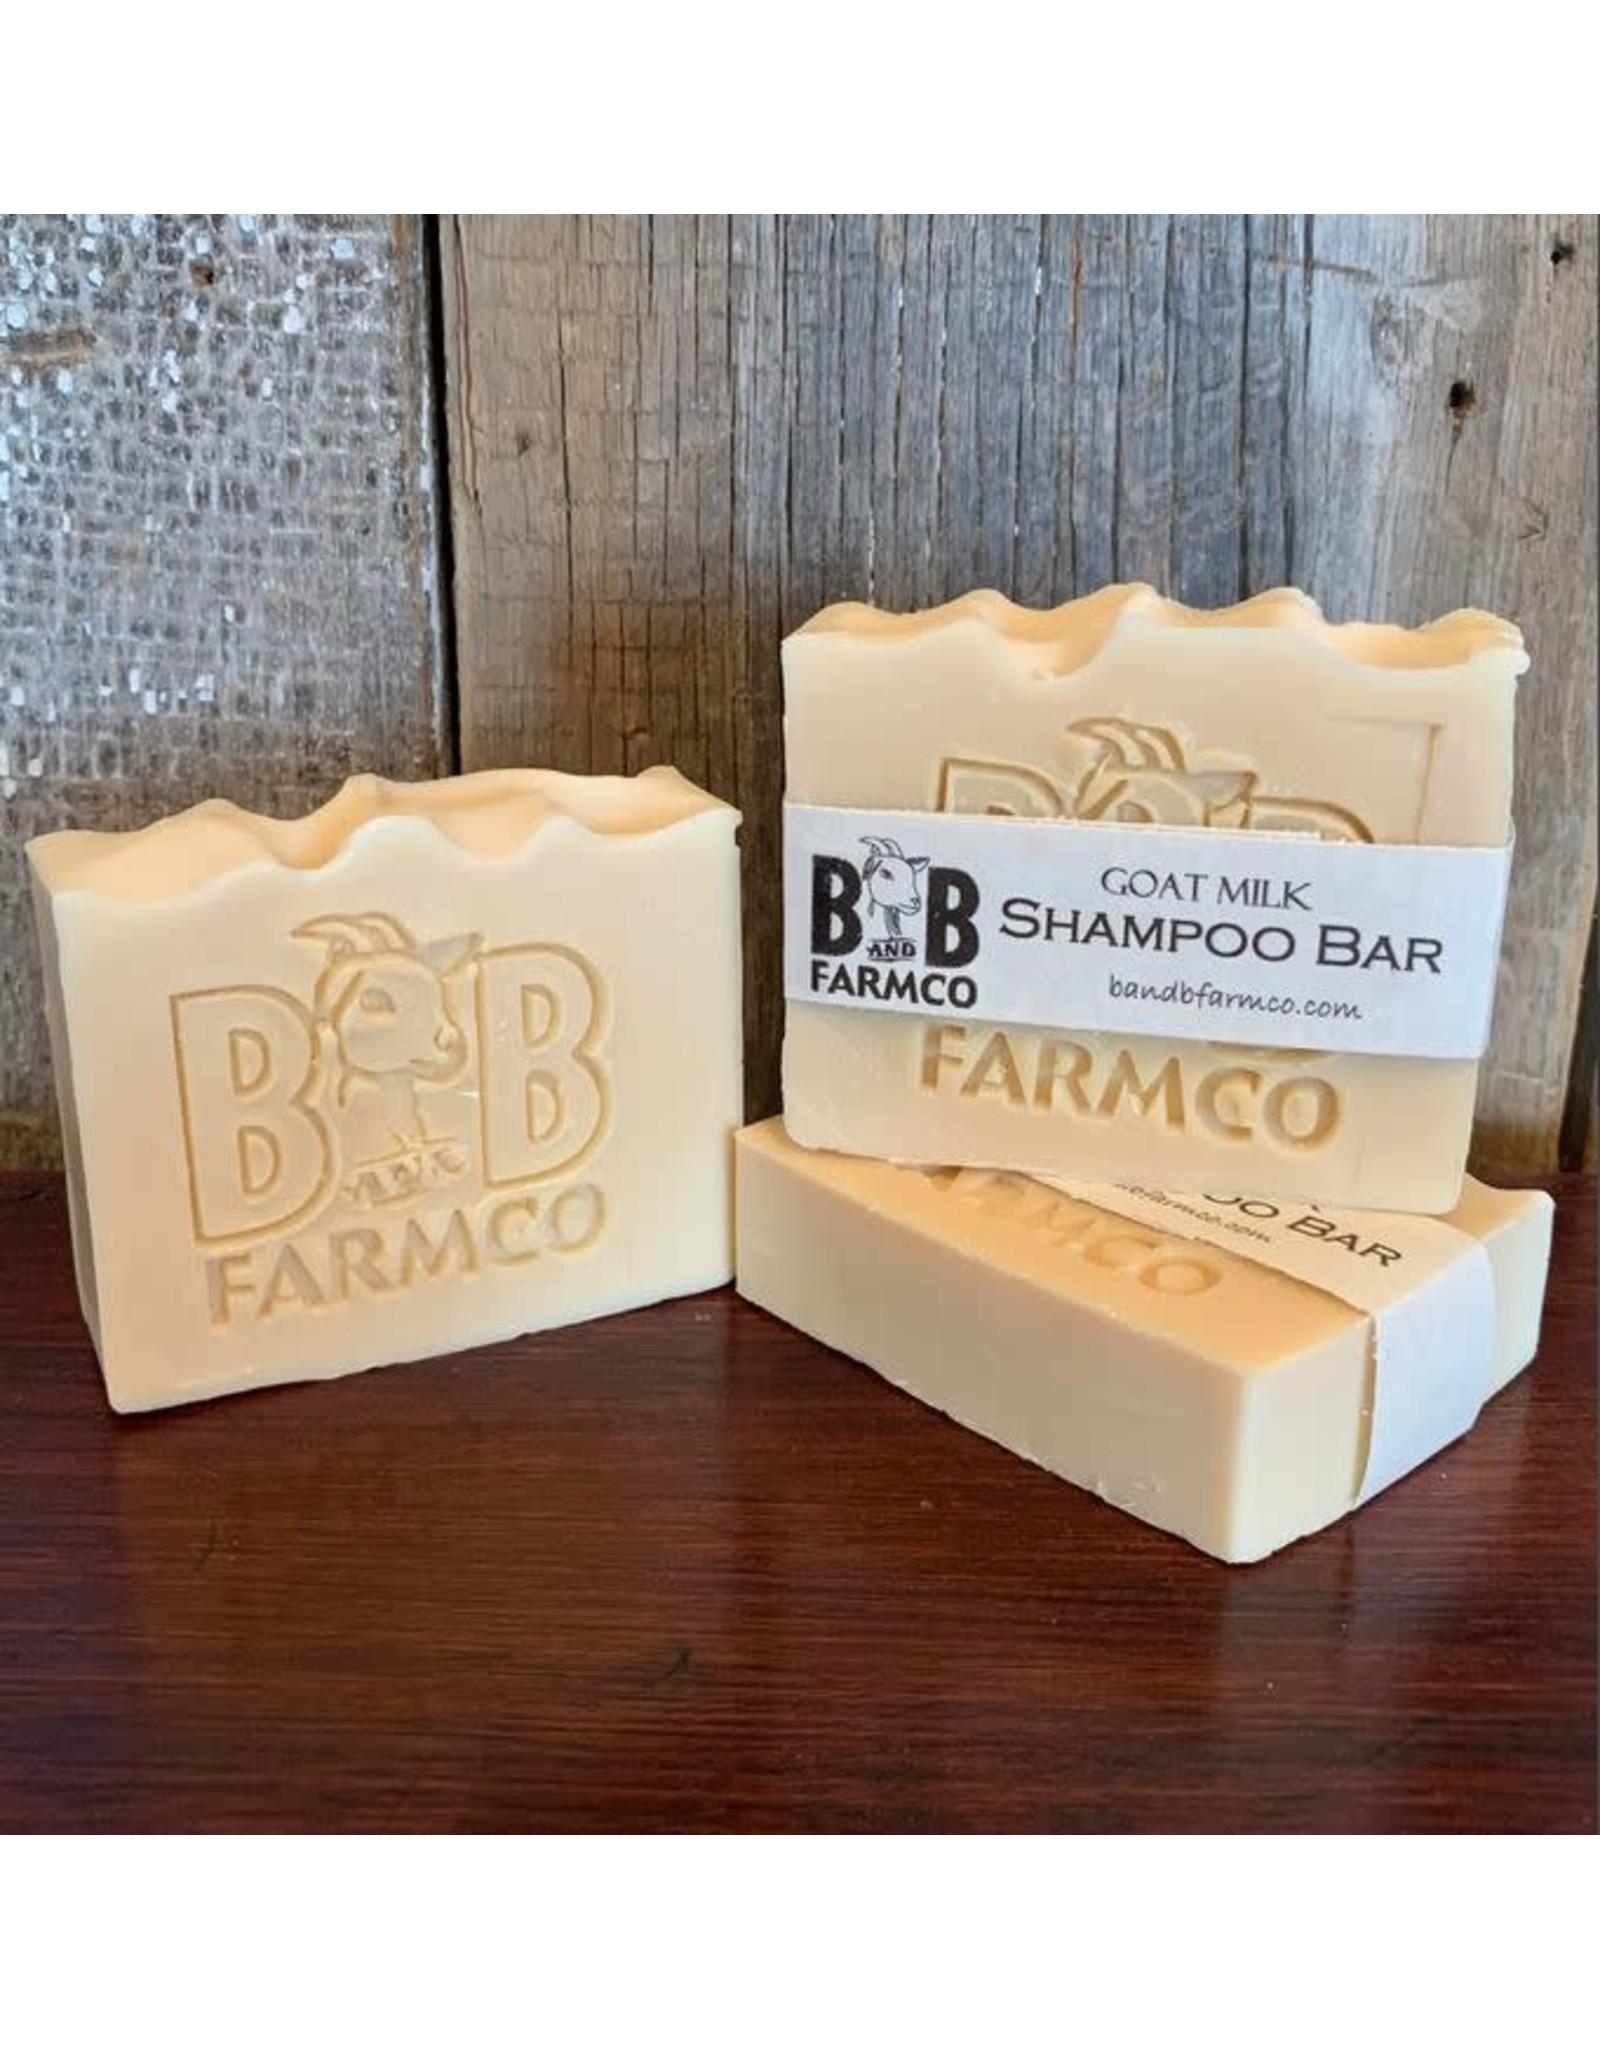 B&B FARM CO B&B GOAT MILK SHAMPOO BAR